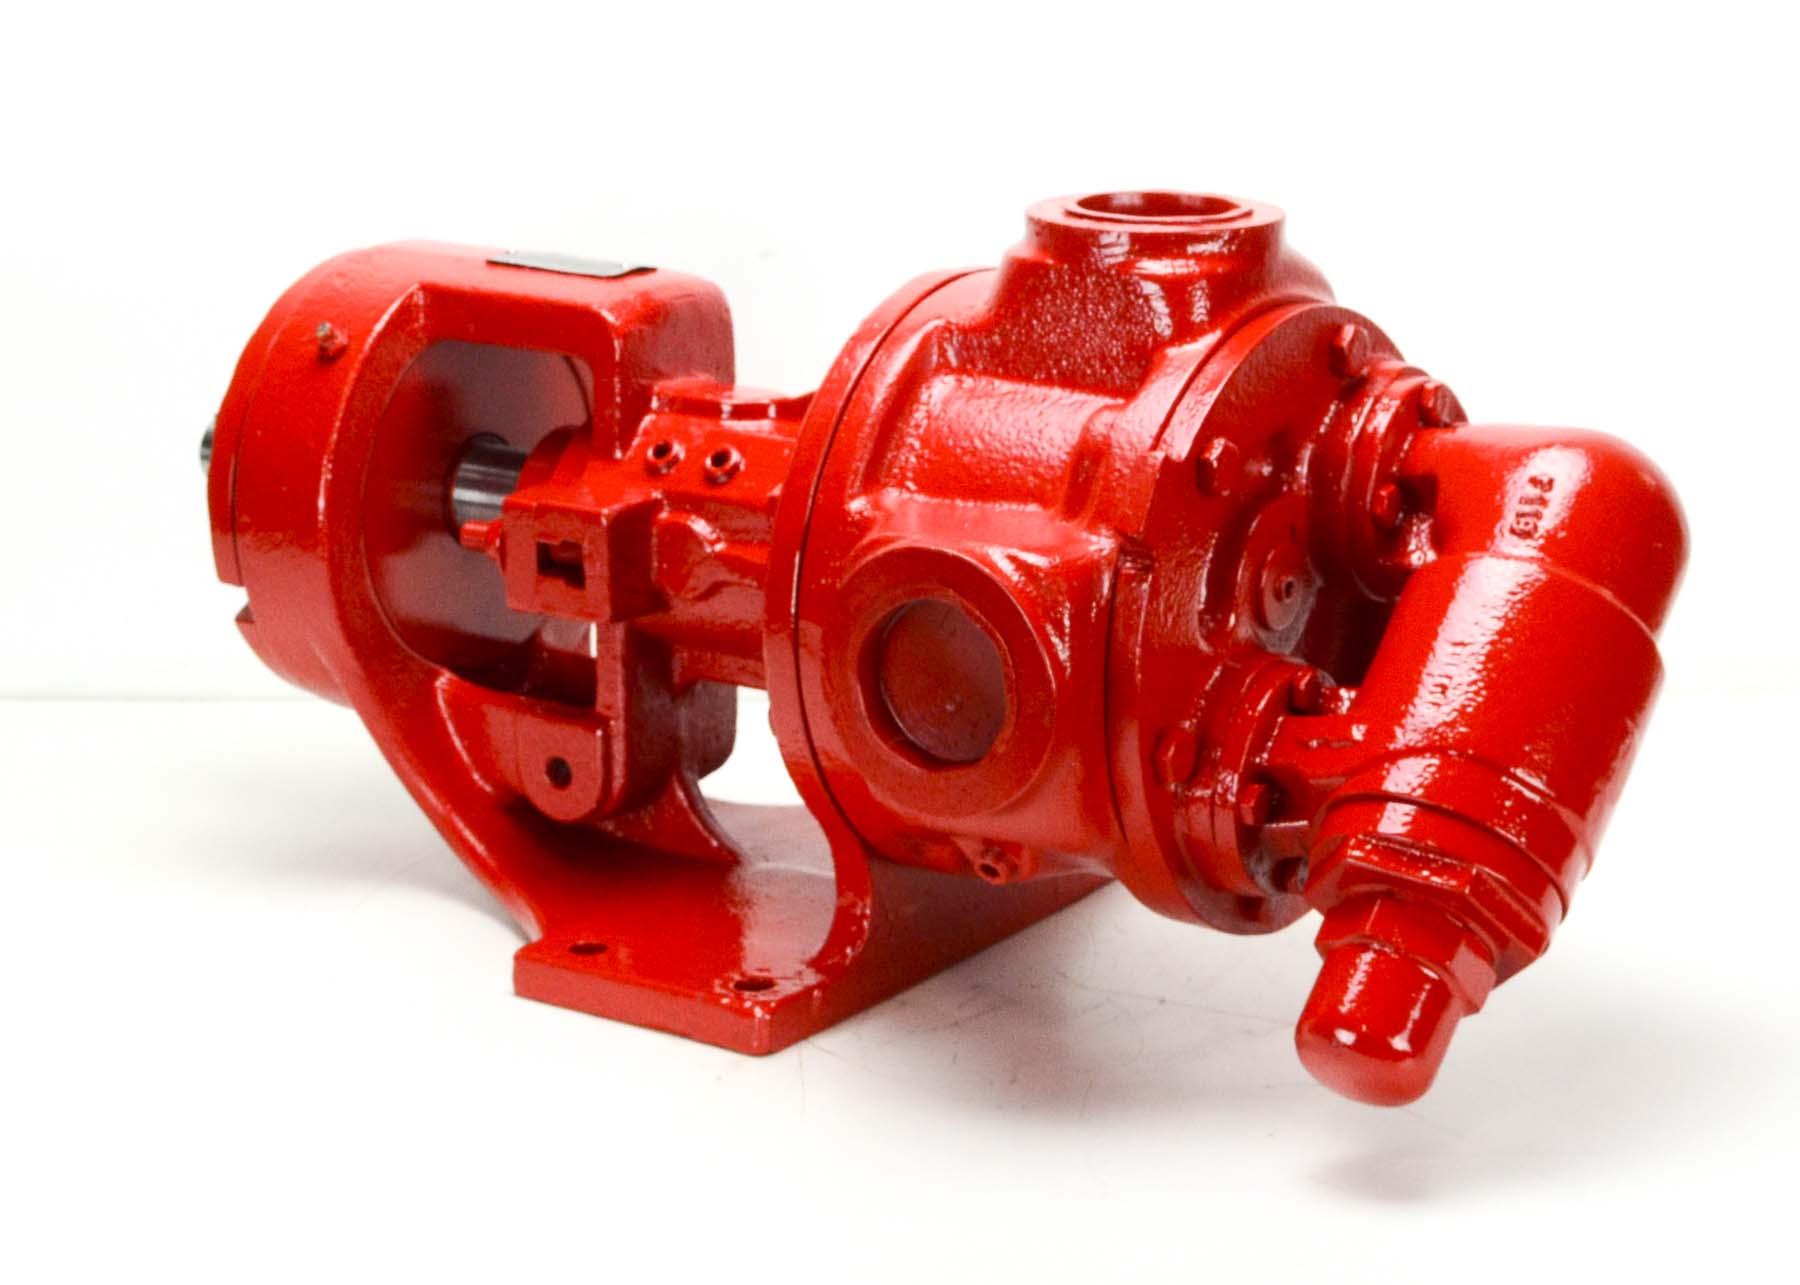 Spectrom SG-11022 Pump